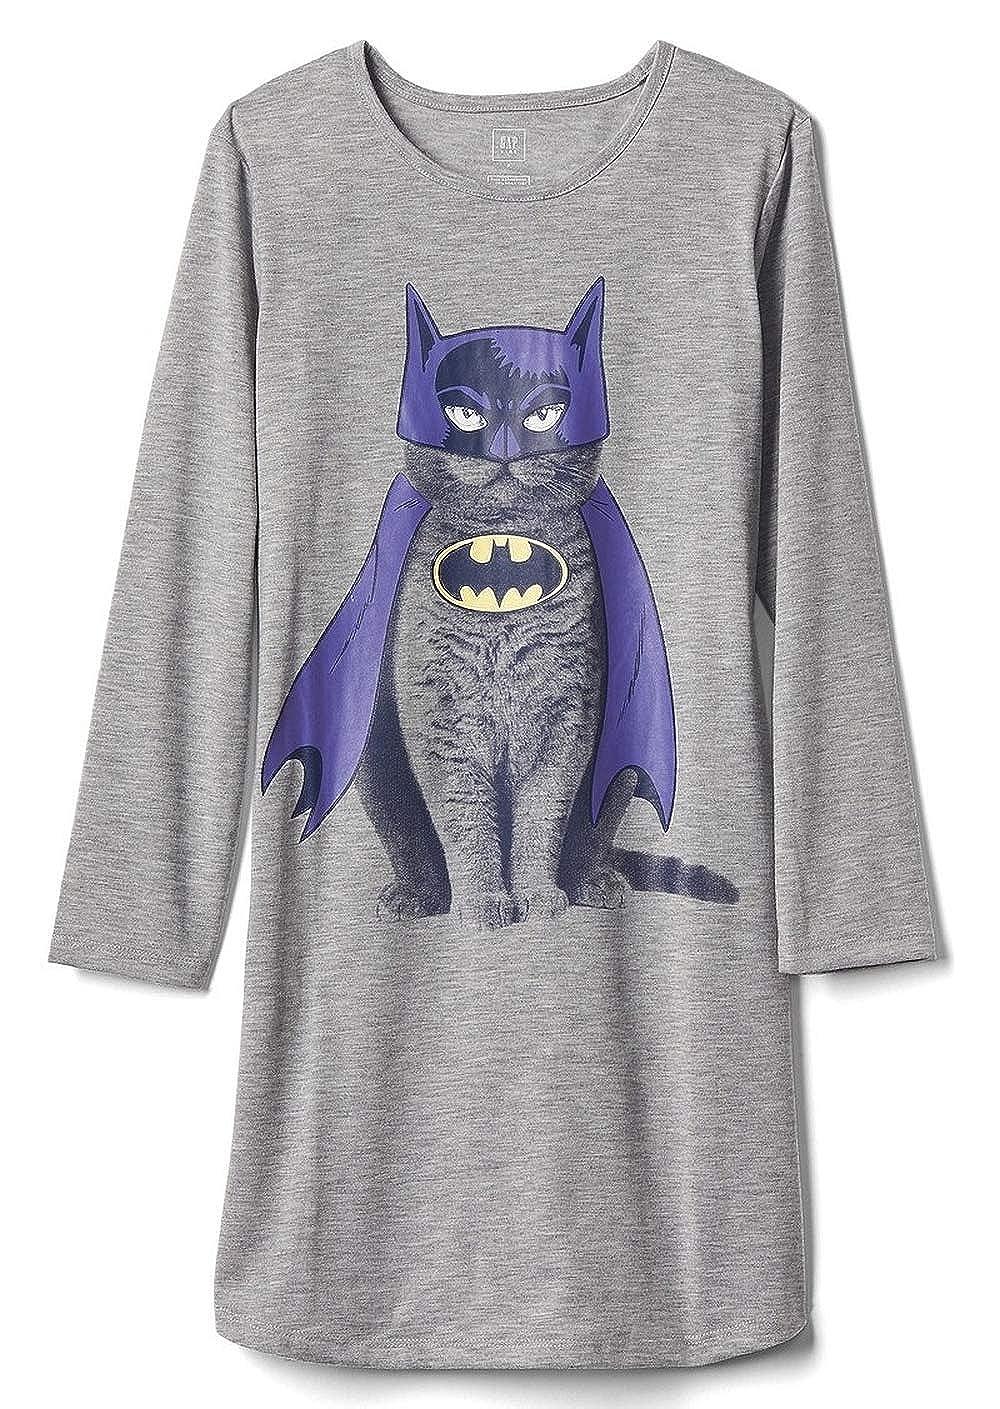 Batman Cat Nightgown Girls Size 8 Batgirl Gown Gray